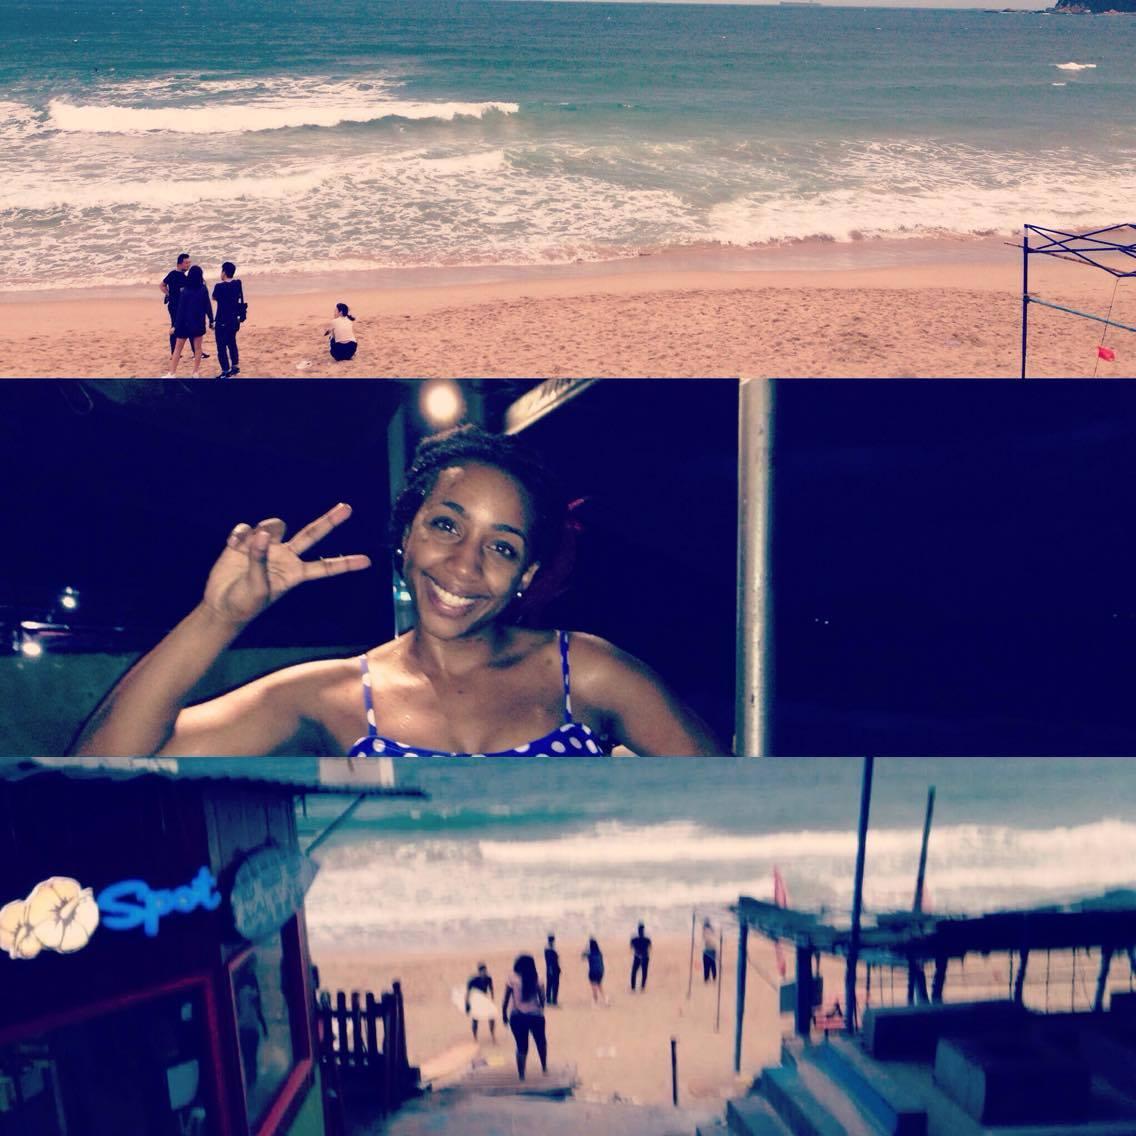 Xi Chong Beach